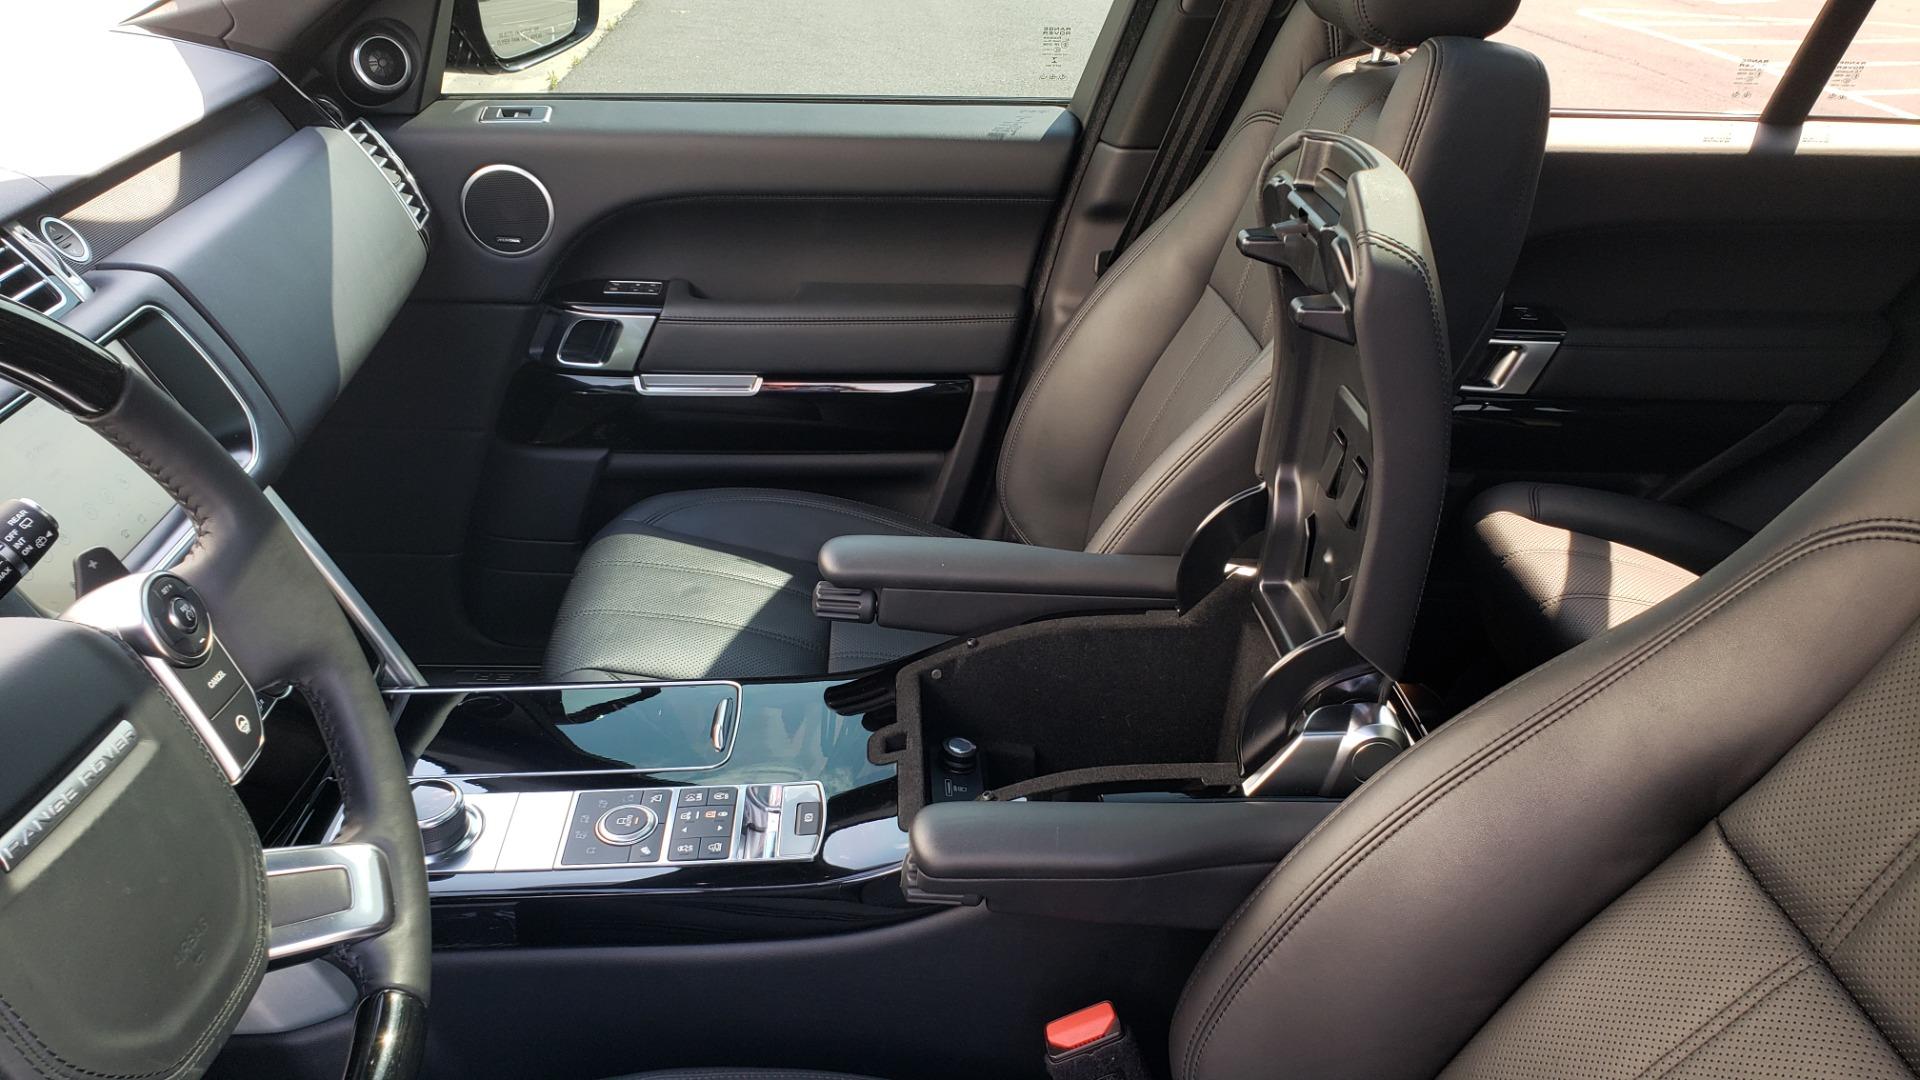 Used 2017 Land Rover RANGE ROVER SC V8 / VISION ASST / DRIVE PKG / MERIDIAN SOUND / PANO-ROOF / NAV / BSM for sale $75,995 at Formula Imports in Charlotte NC 28227 65